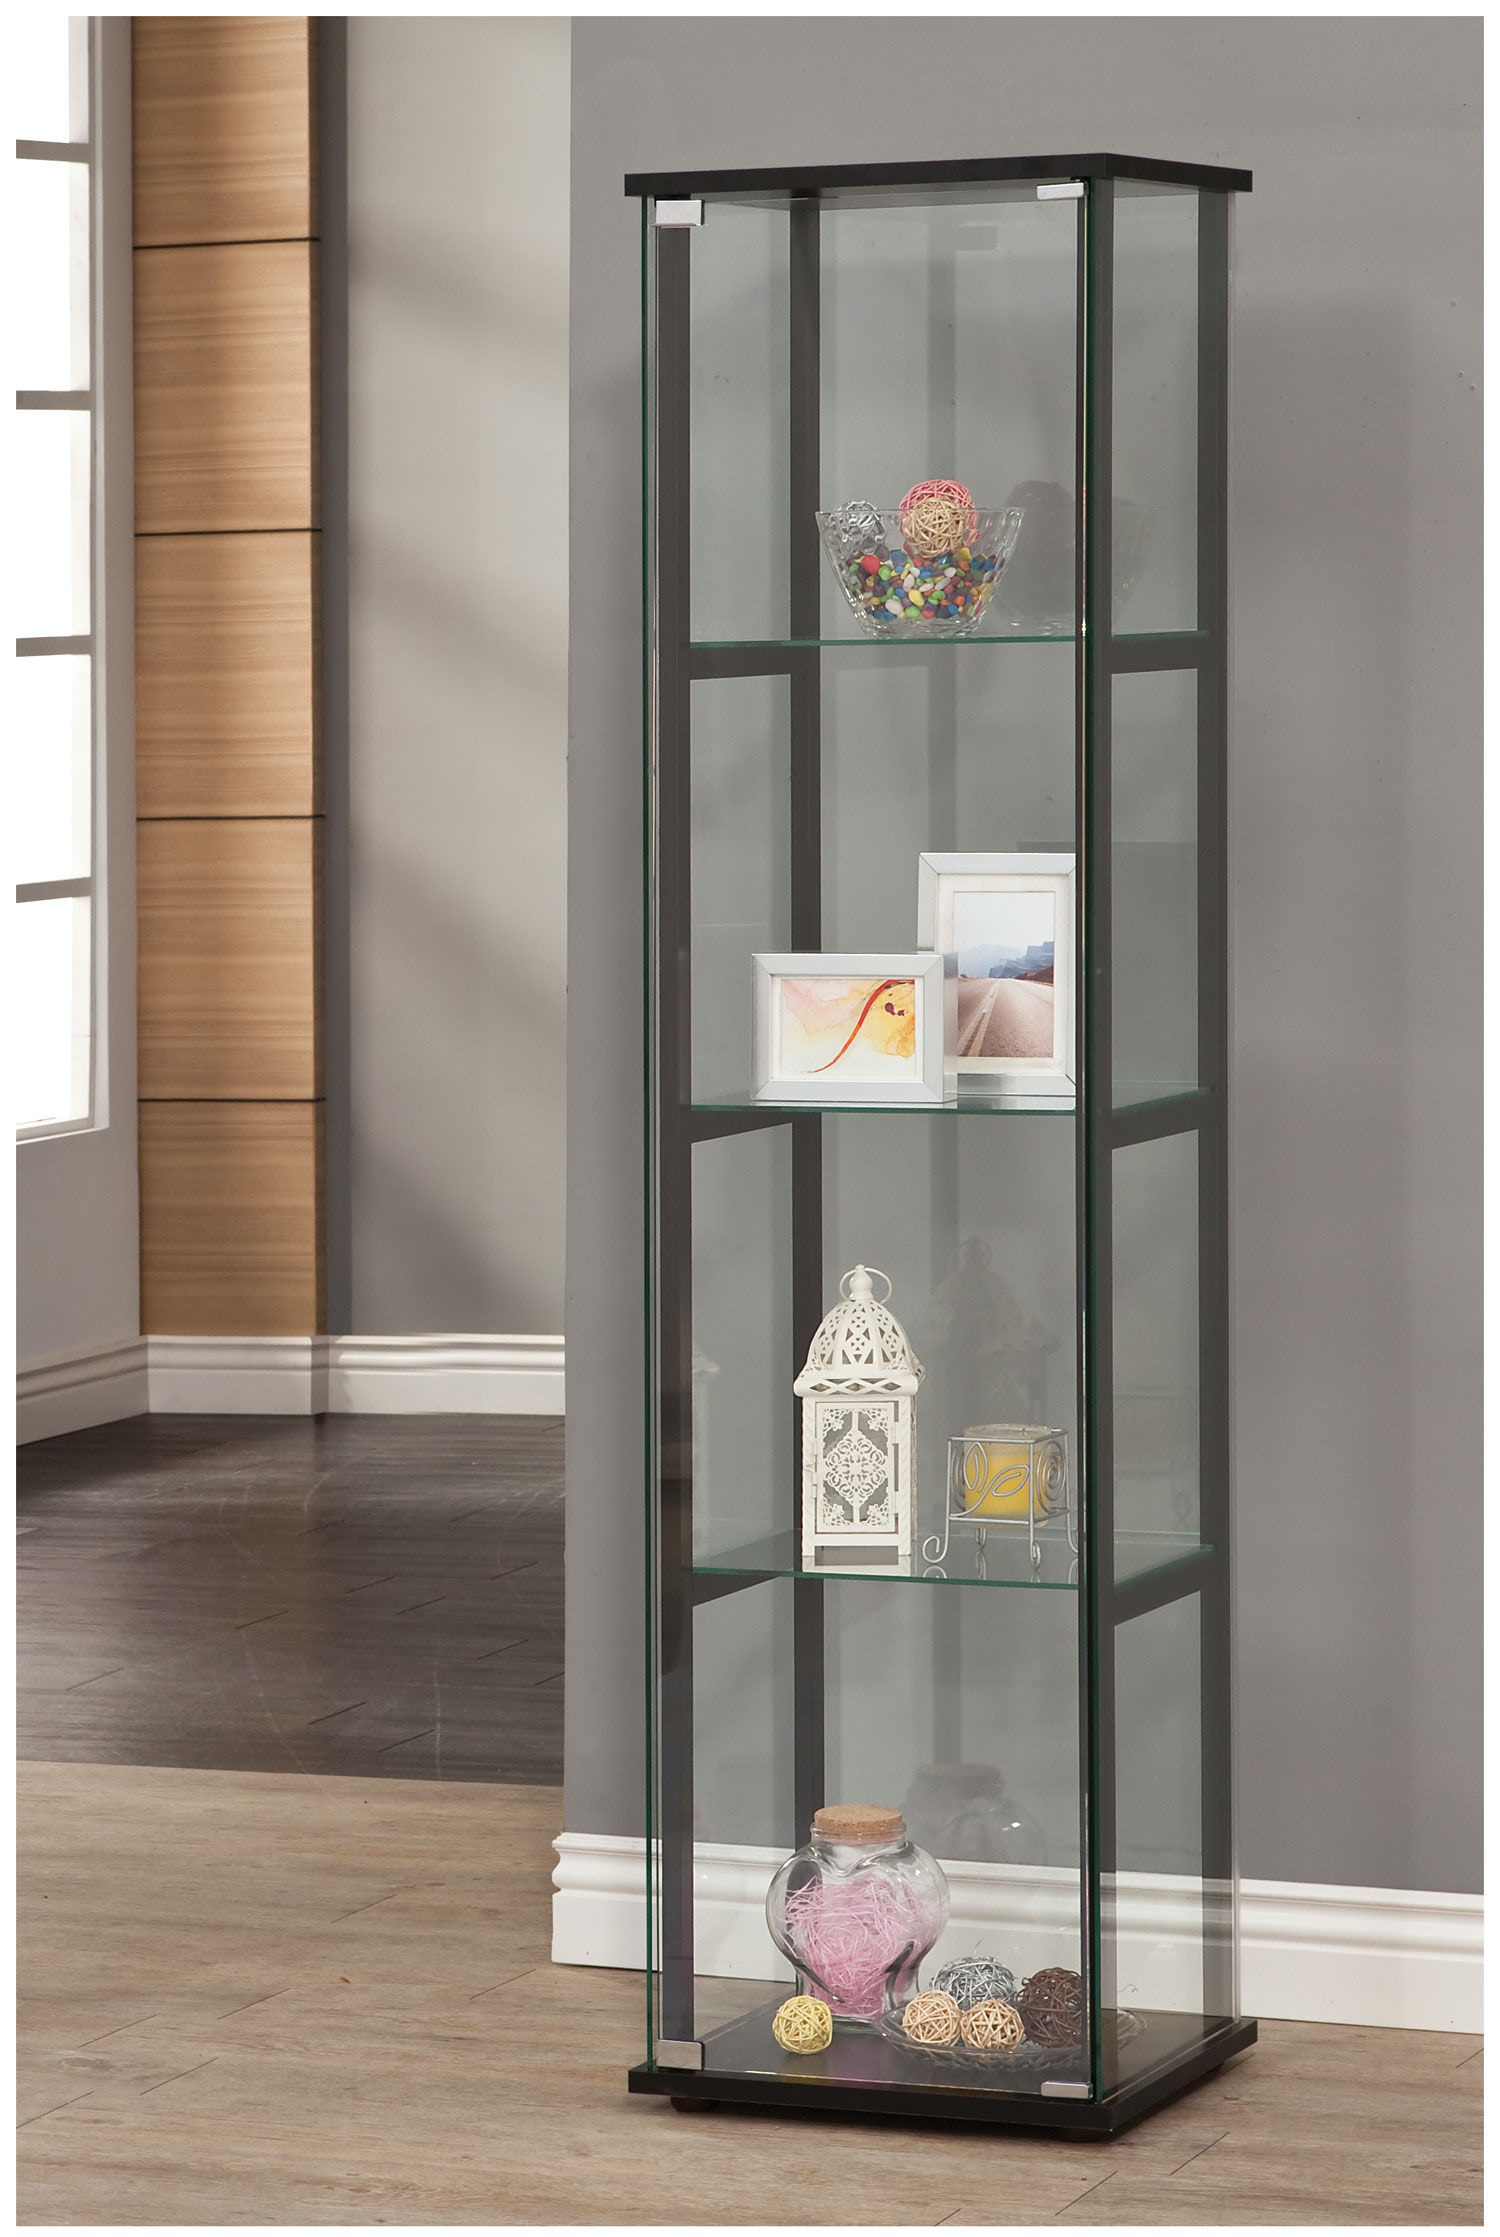 coaster living room curio cabinet 950171 home decor acme furniture living room adjustable sofa 15282 home